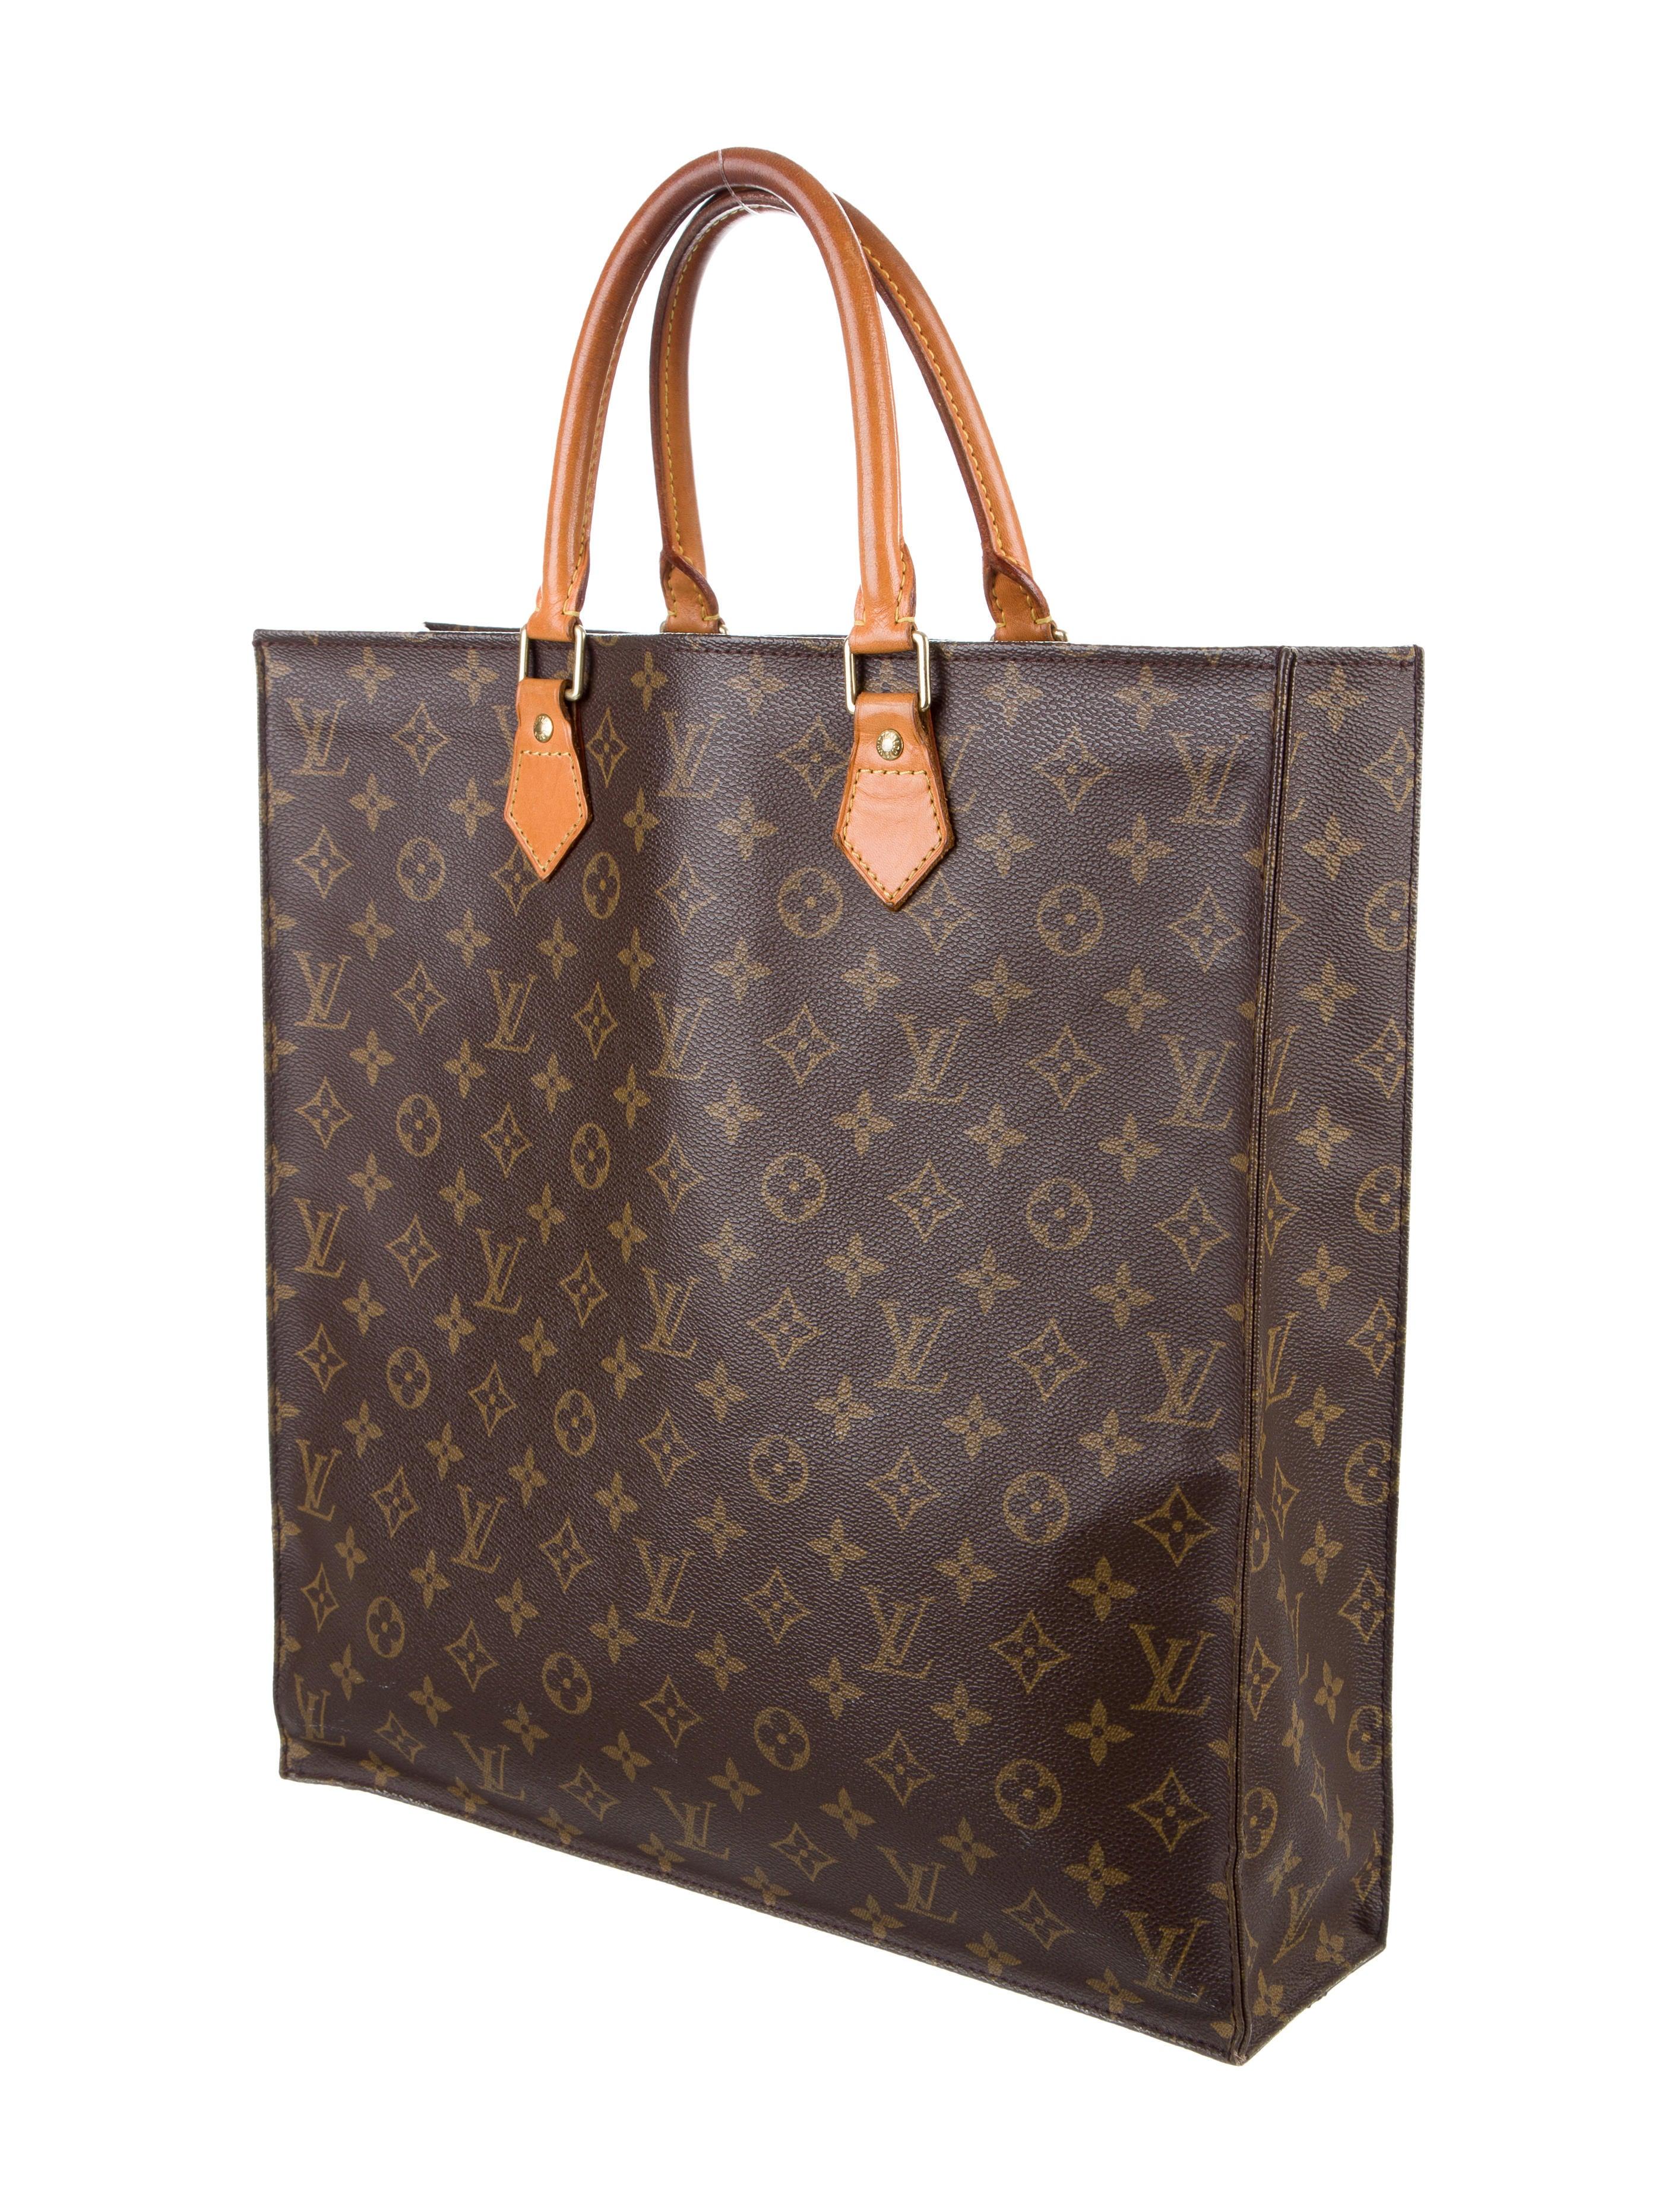 Louis vuitton monogram sac plat handbags lou121387 for Louis vuitton monogram miroir sac plat